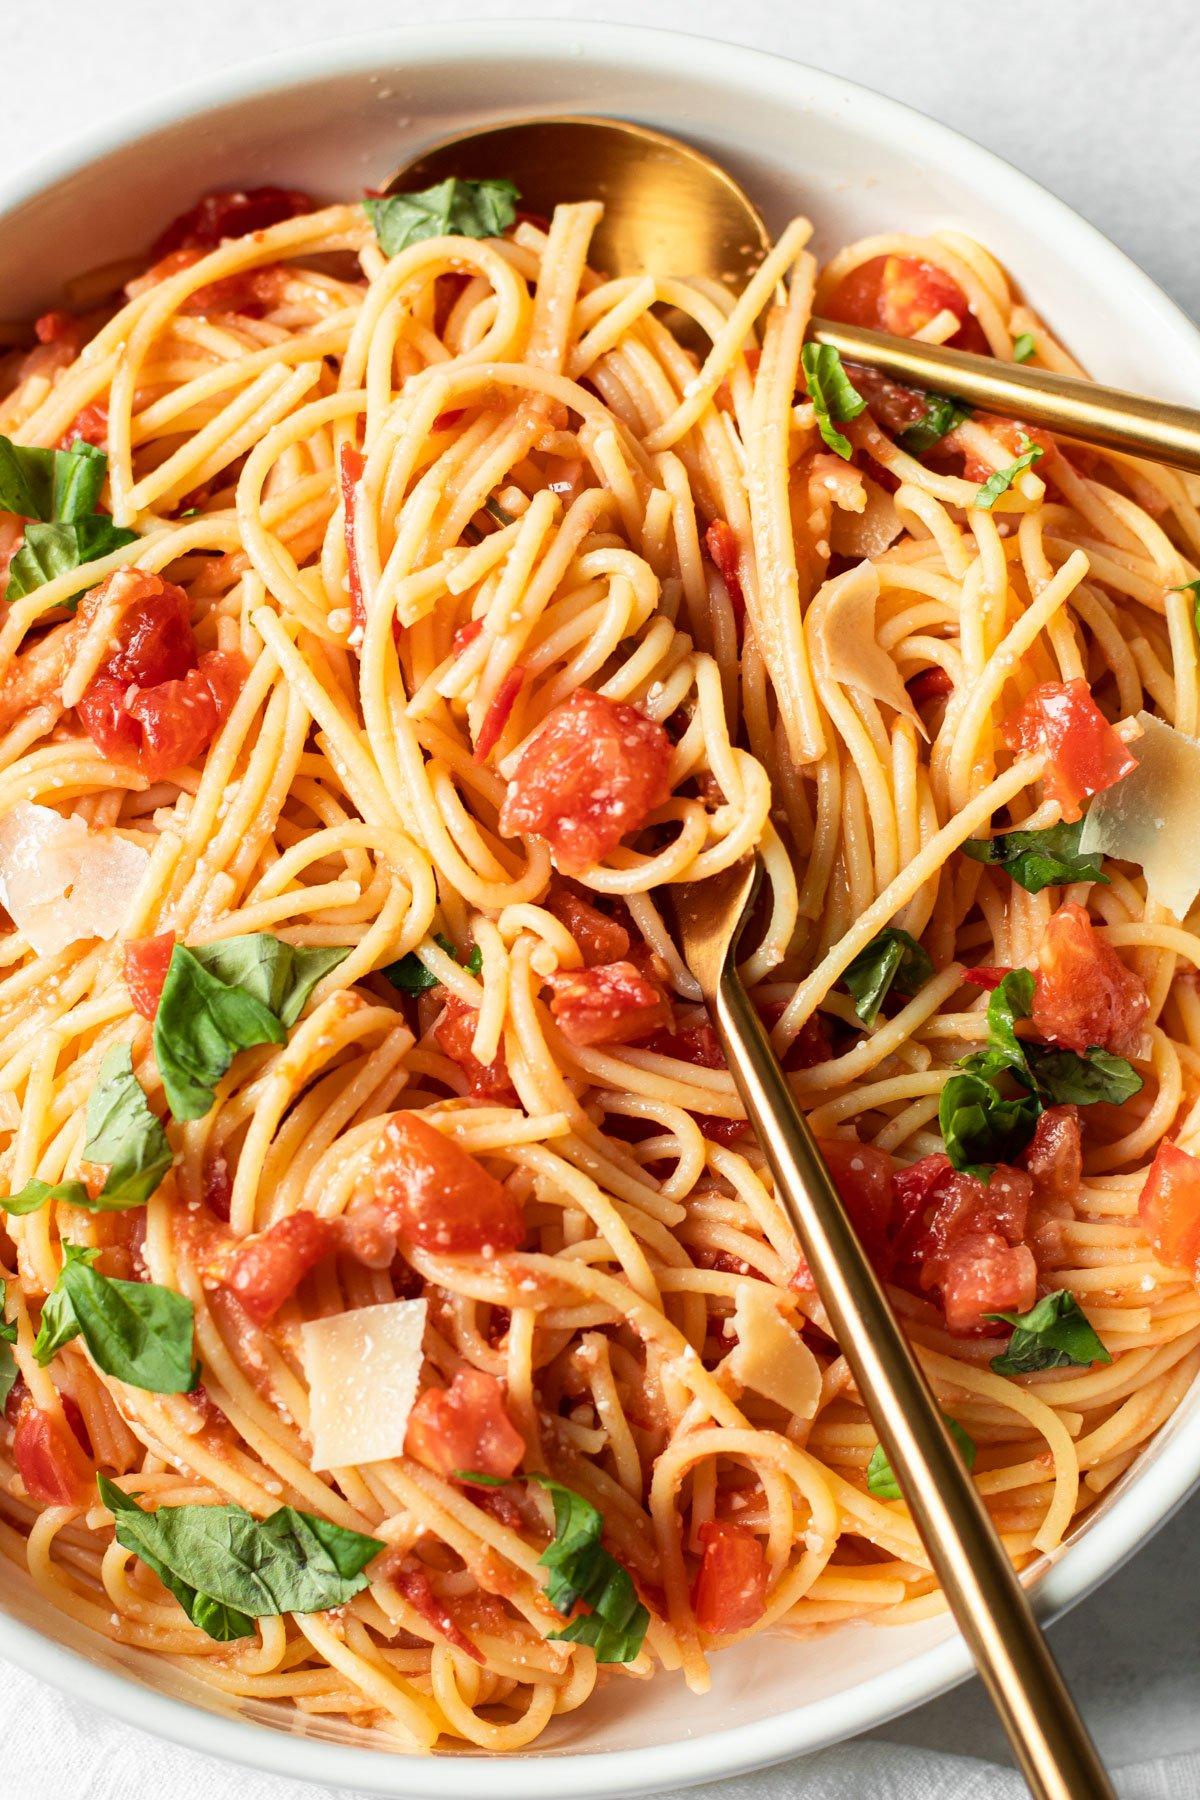 A bowl of fresh tomato spaghetti with basil.